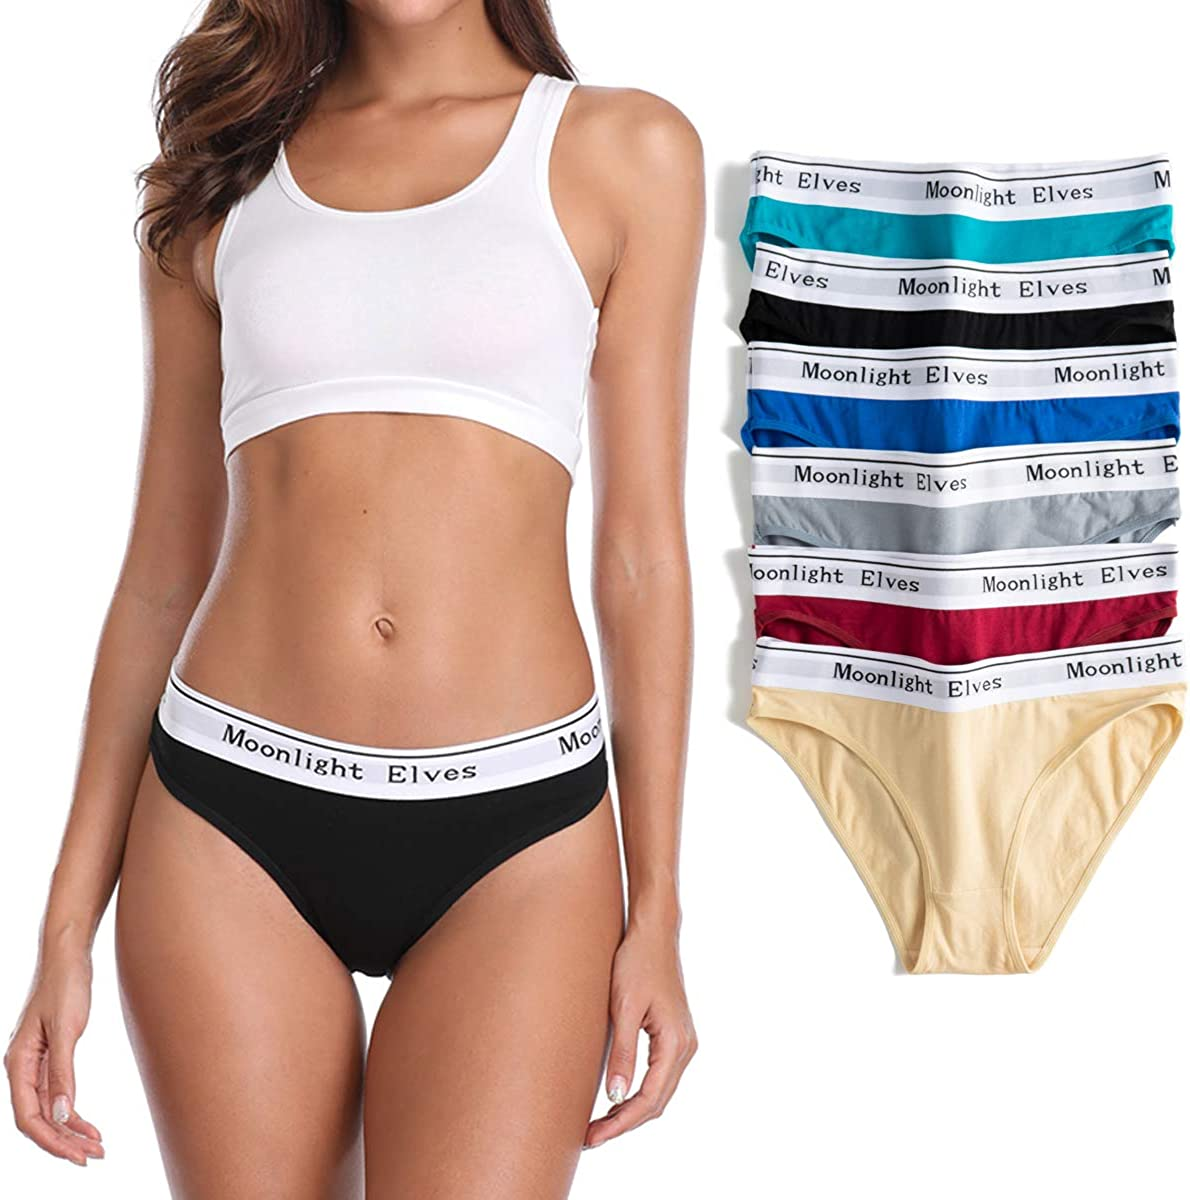 moonlight elves Womens Cotton Underwear Hipsters Panties-Briefs Panty Pack of 4//6//8